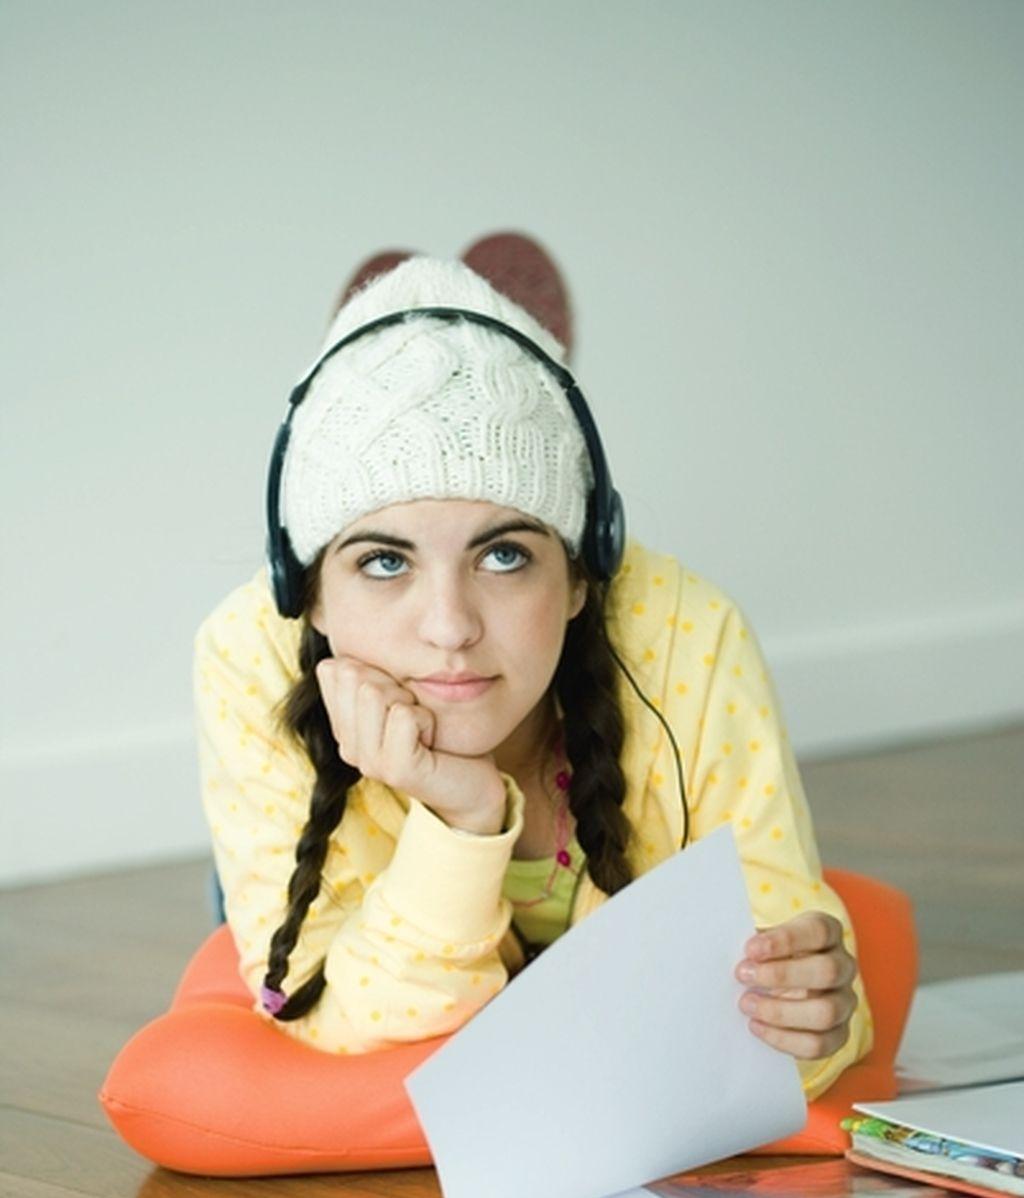 Una chica escuchando música